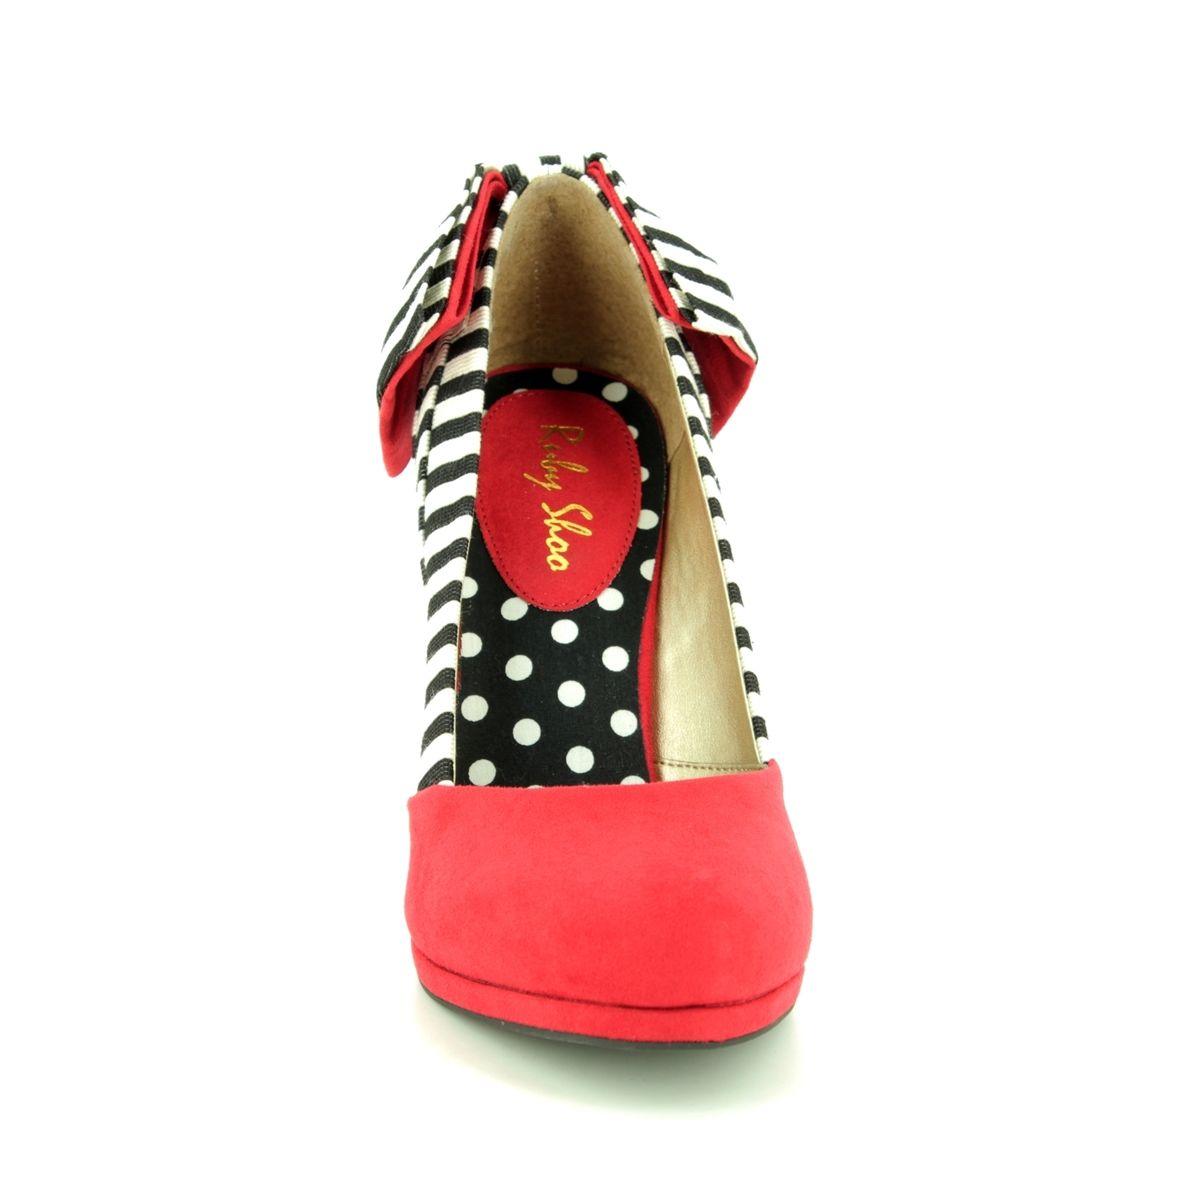 Red Ruby Katie 09217 Shoes Shoo 80 High Heeled rUqwnUI5x